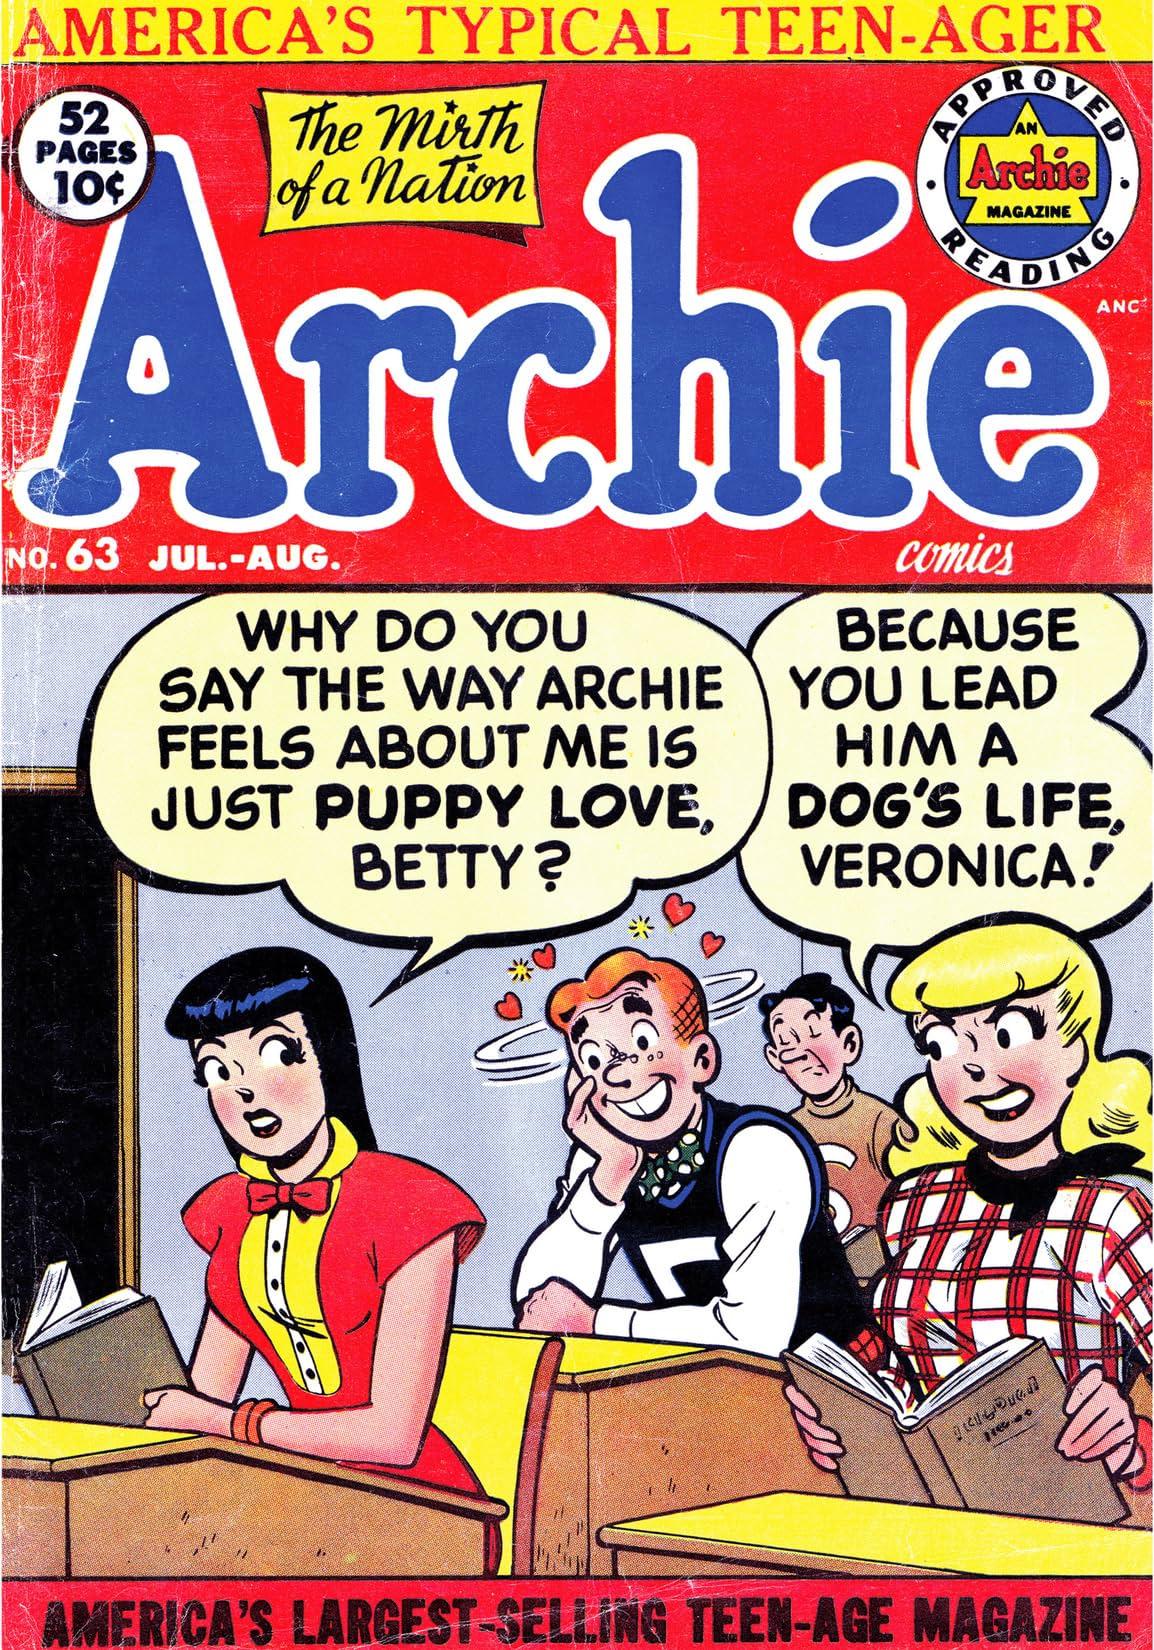 Archie #63